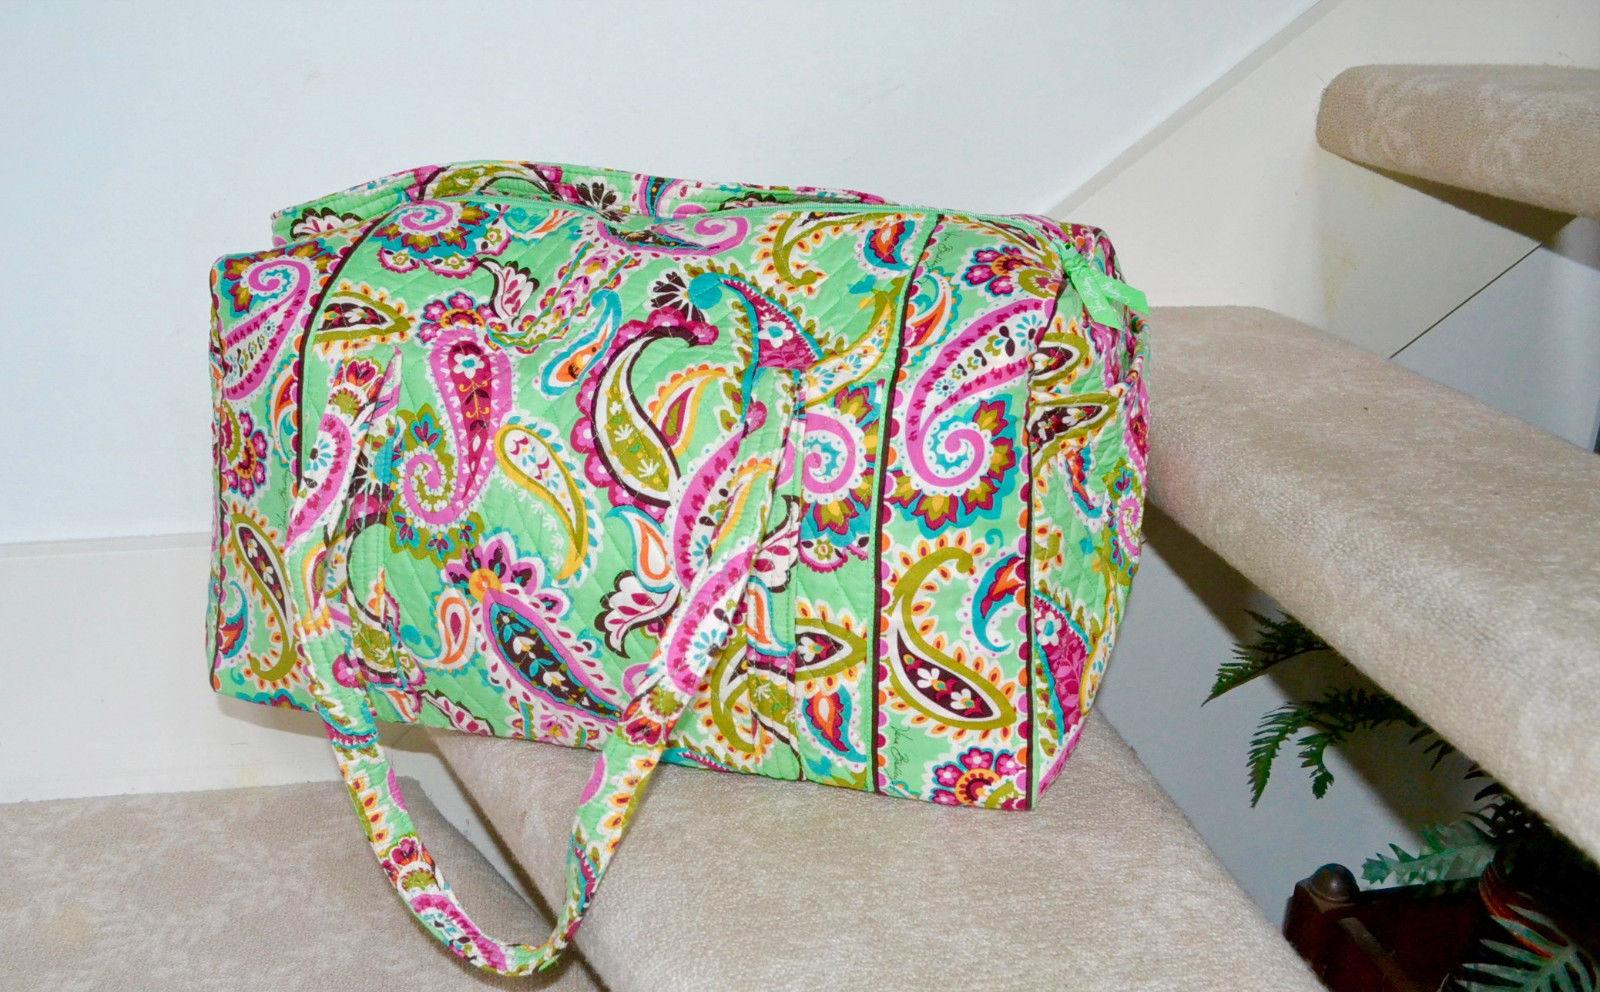 NWT $85 Vera Bradley - Large Duffel Bag WEEKENDER Tutti Frutti Green Print